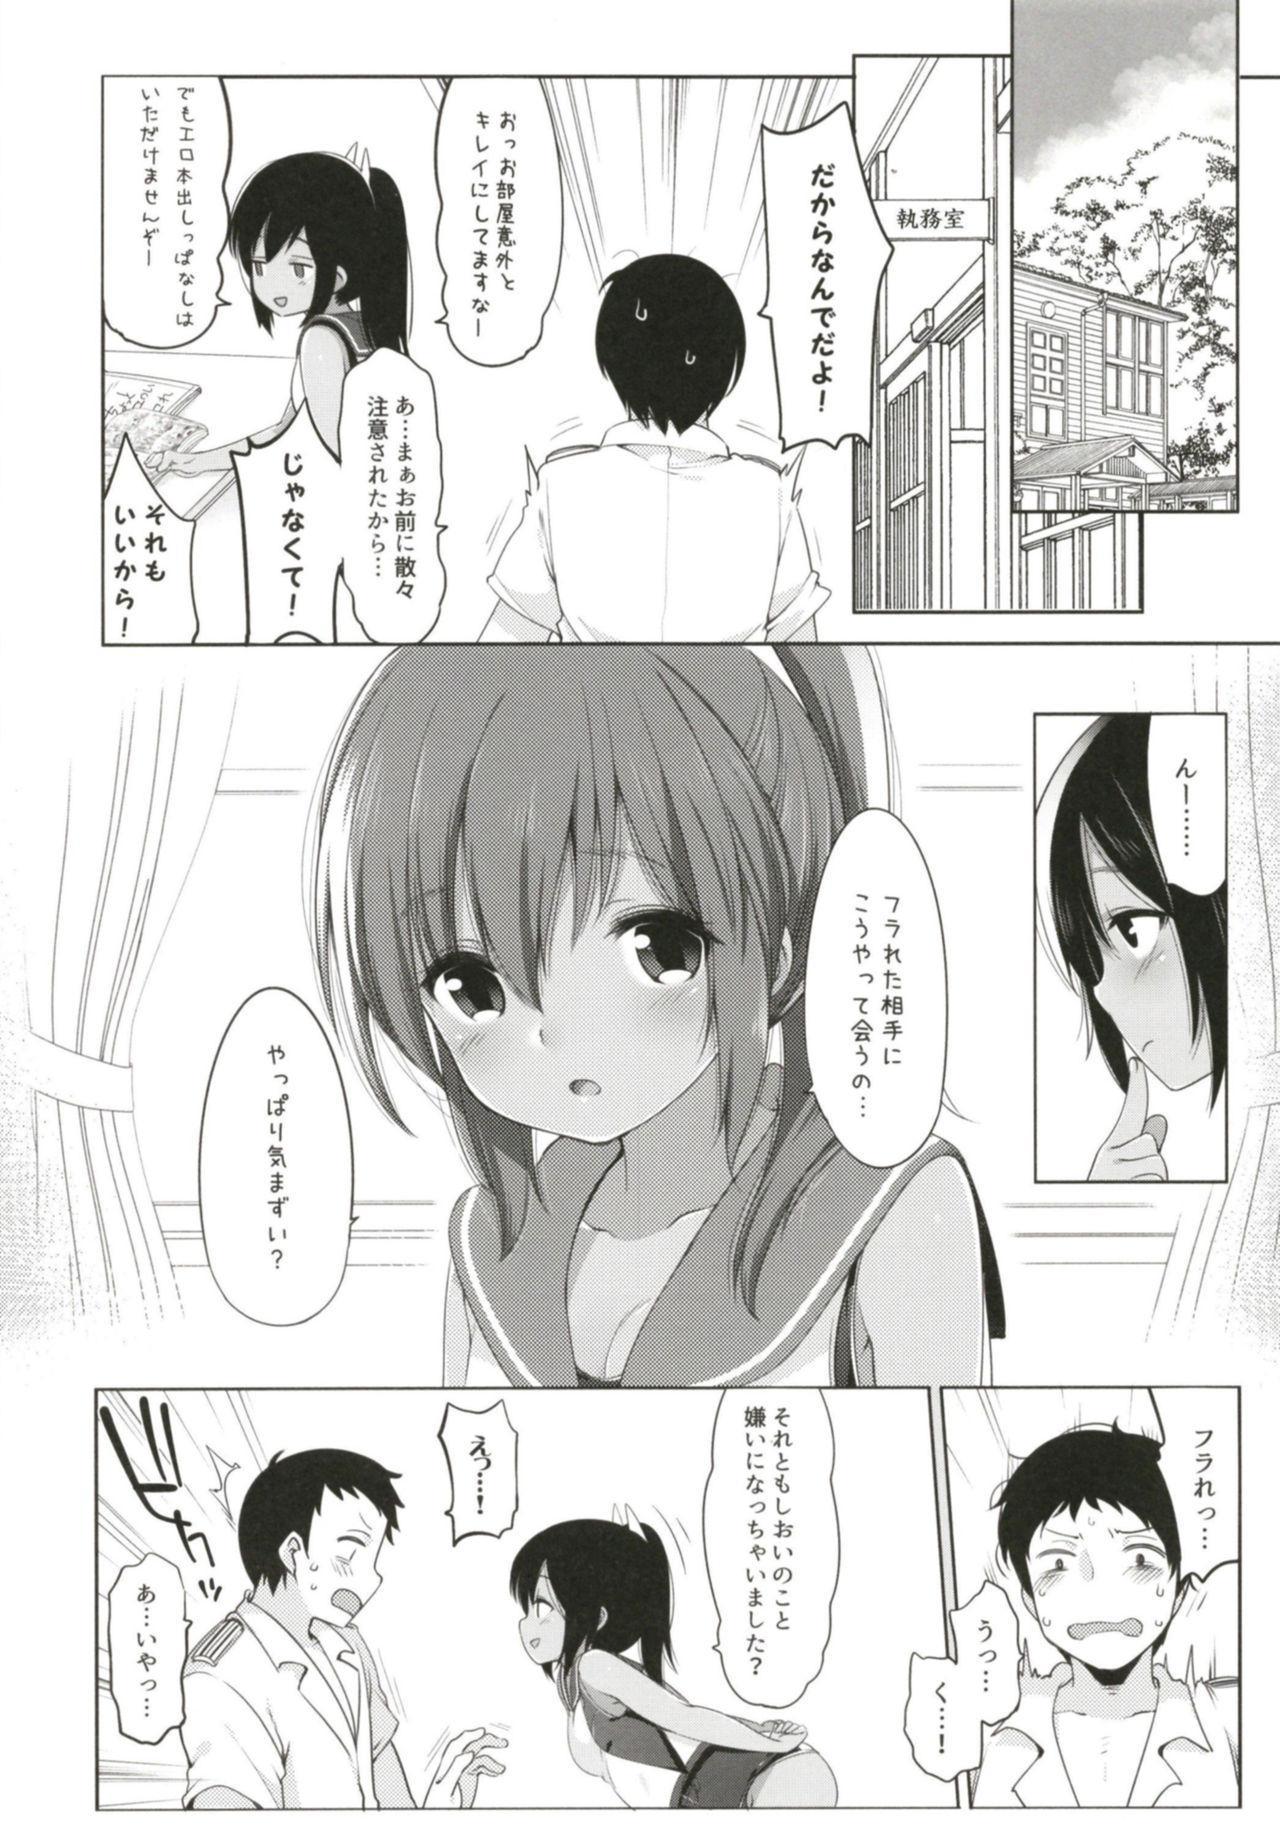 [French letter (Fujisaki Hikari)] Hitonatsu no Ayamachi -I-401 Soushuuhen- (Kantai Collection -KanColle-) [Digital] 37